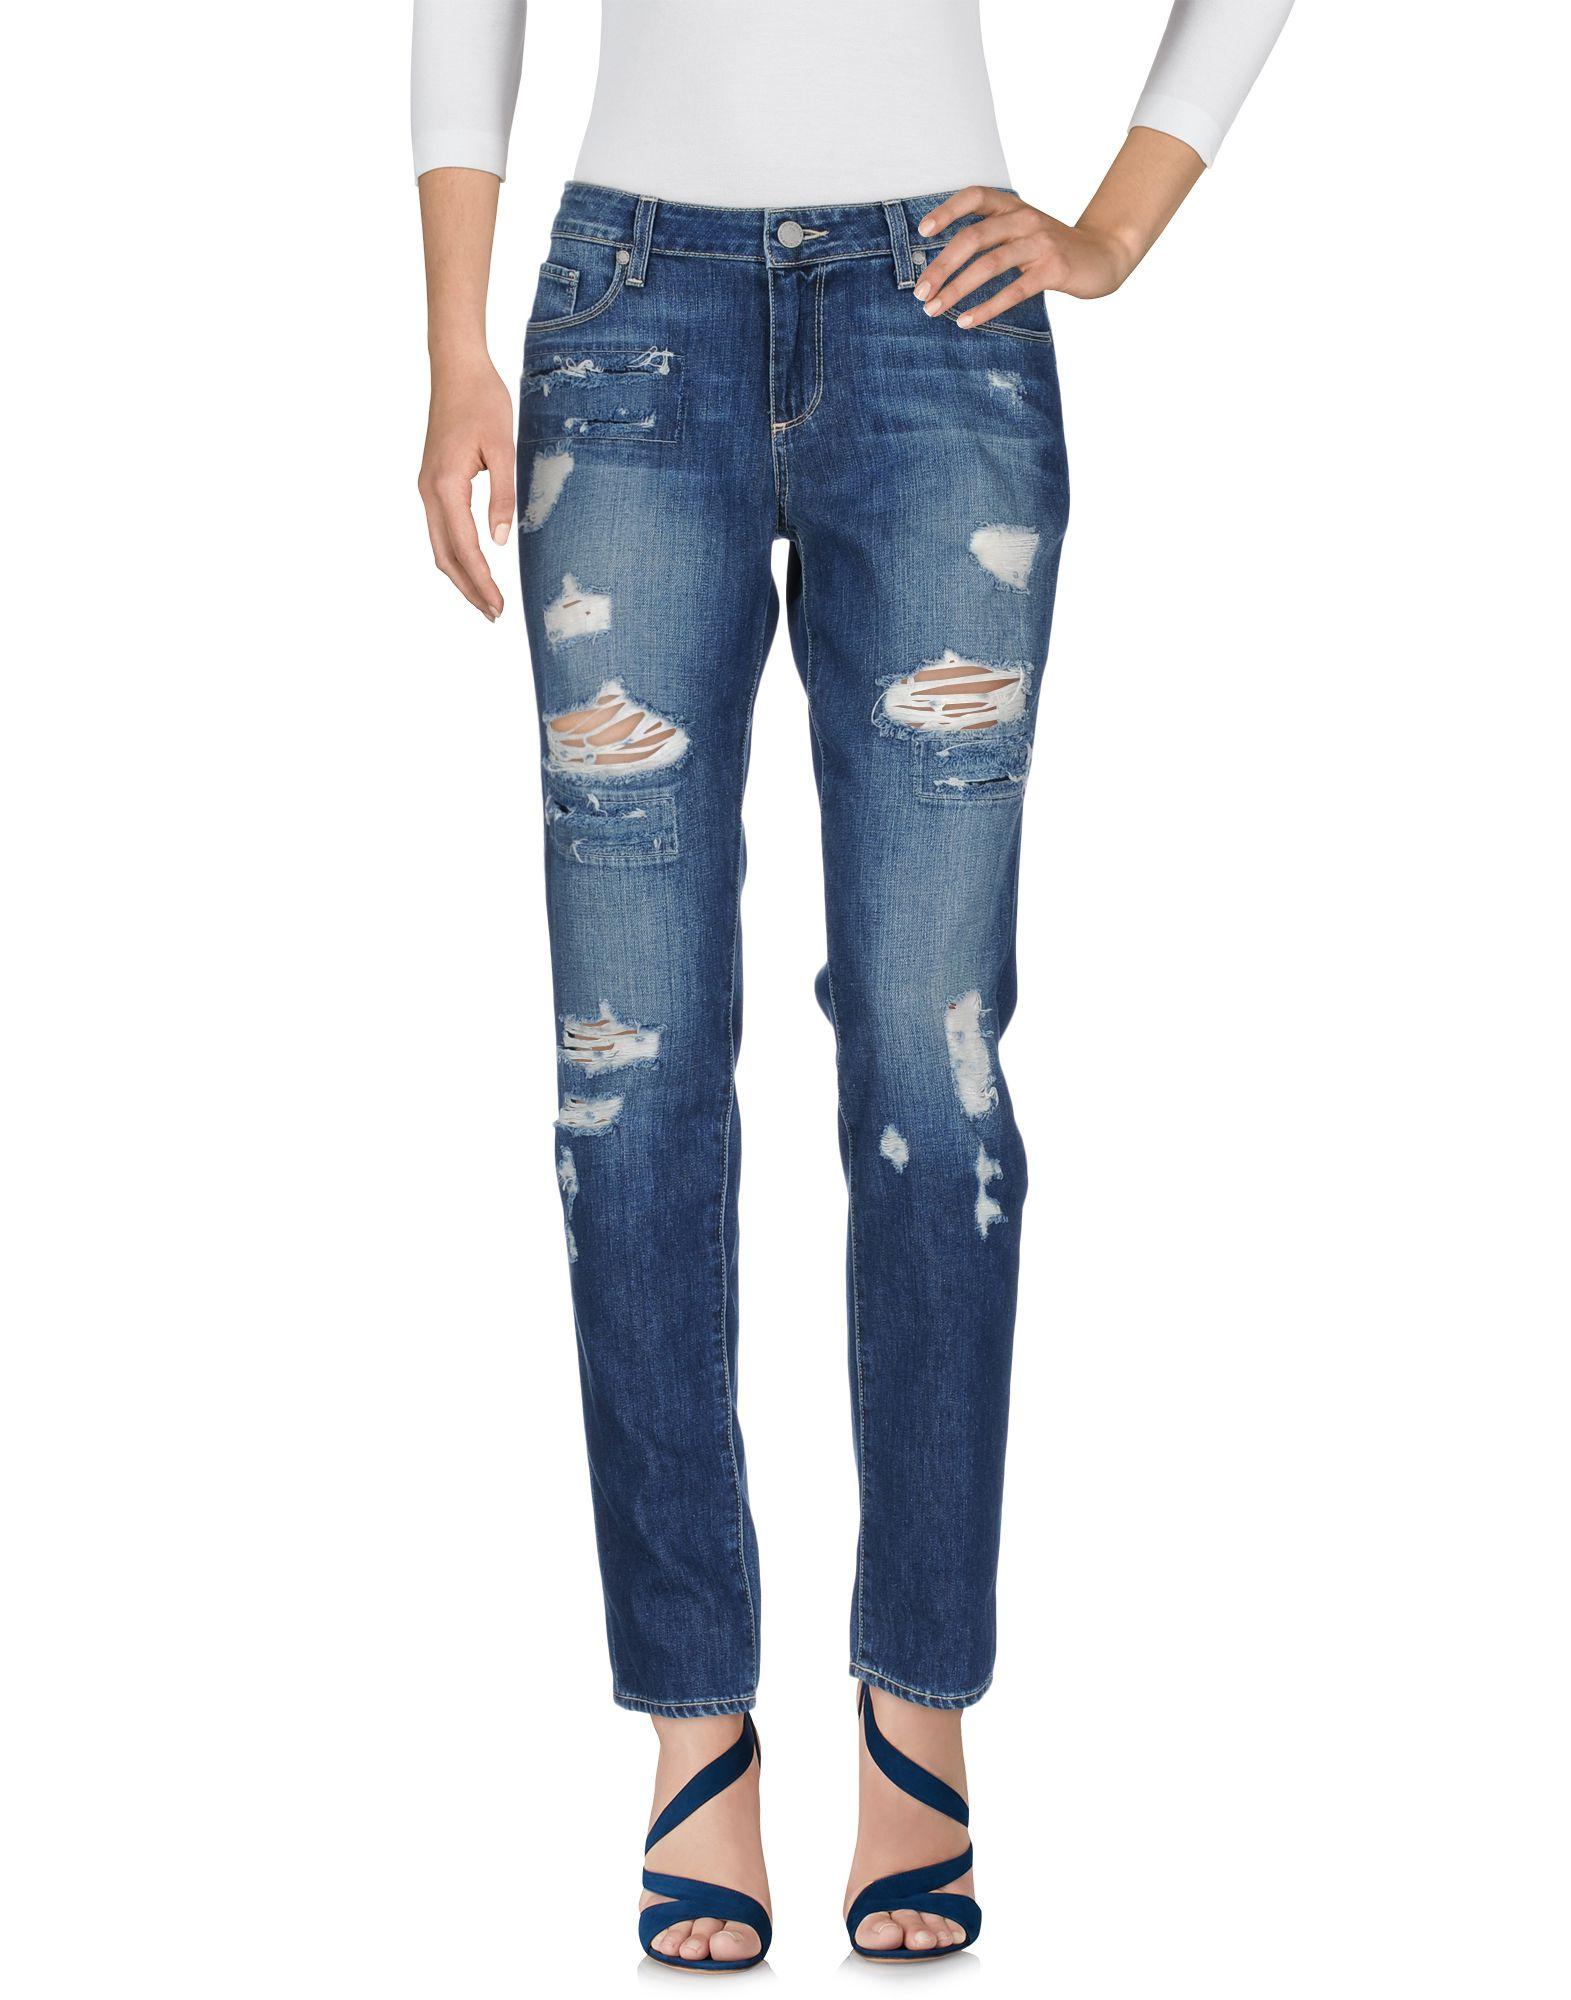 PAIGE Damen Jeanshose Farbe Blau Größe 7